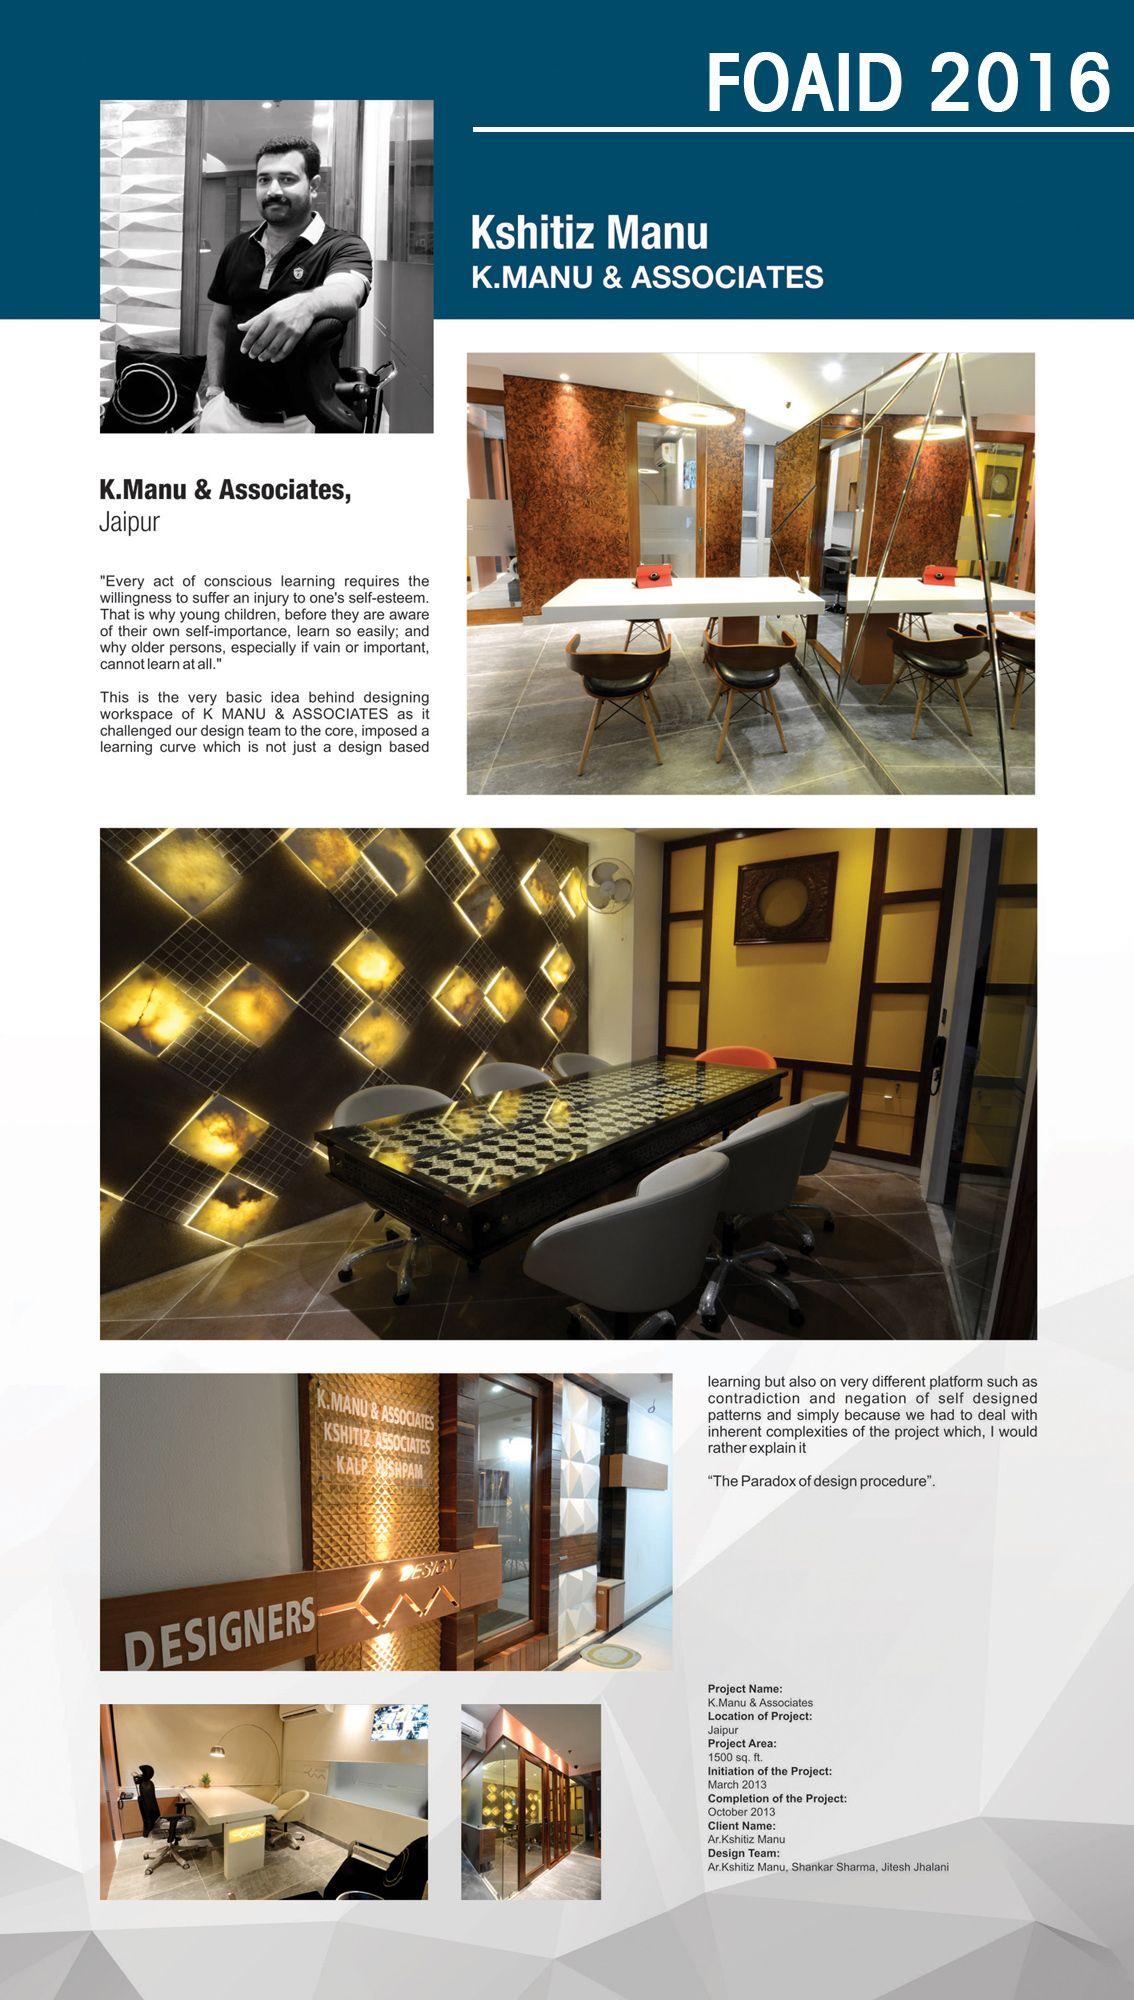 Kshitiz Manu - K  Manu & Associates   FOAID 2016 - Design